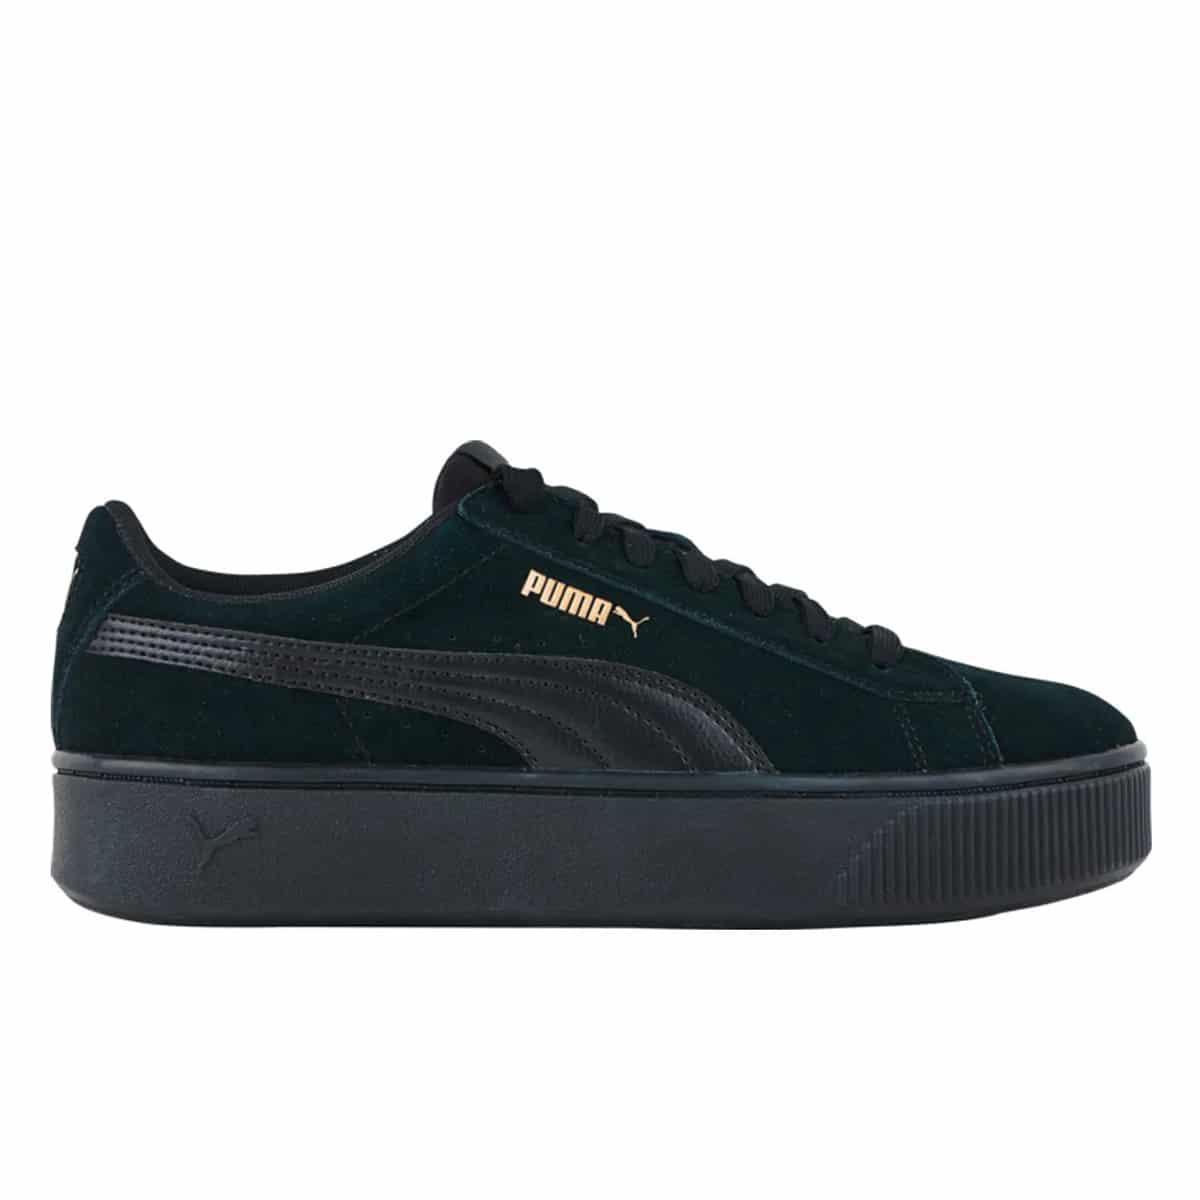 Puma Vikky Stacked SD Black Black   Chaussures Femme   Skate.fr